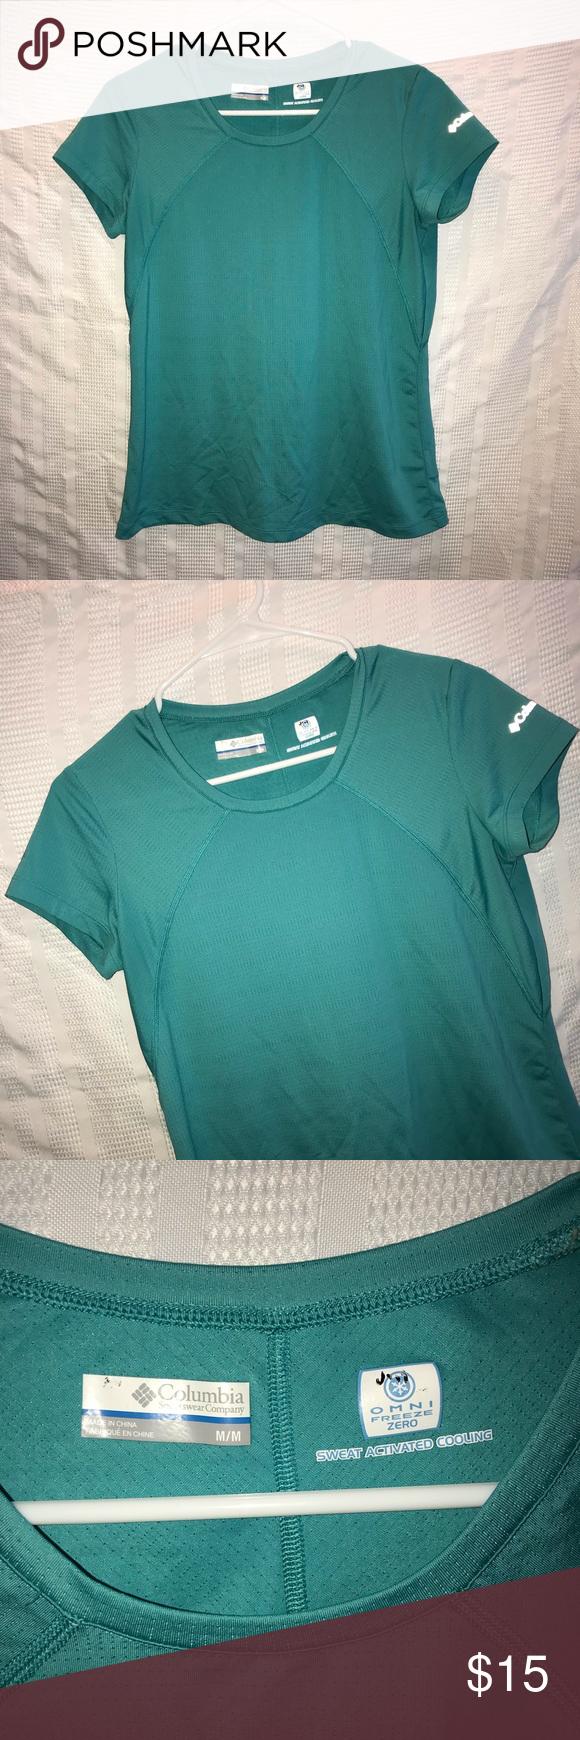 Columbia Omni Freeze Zero Sweat Activated Shirt M Cool Shirts